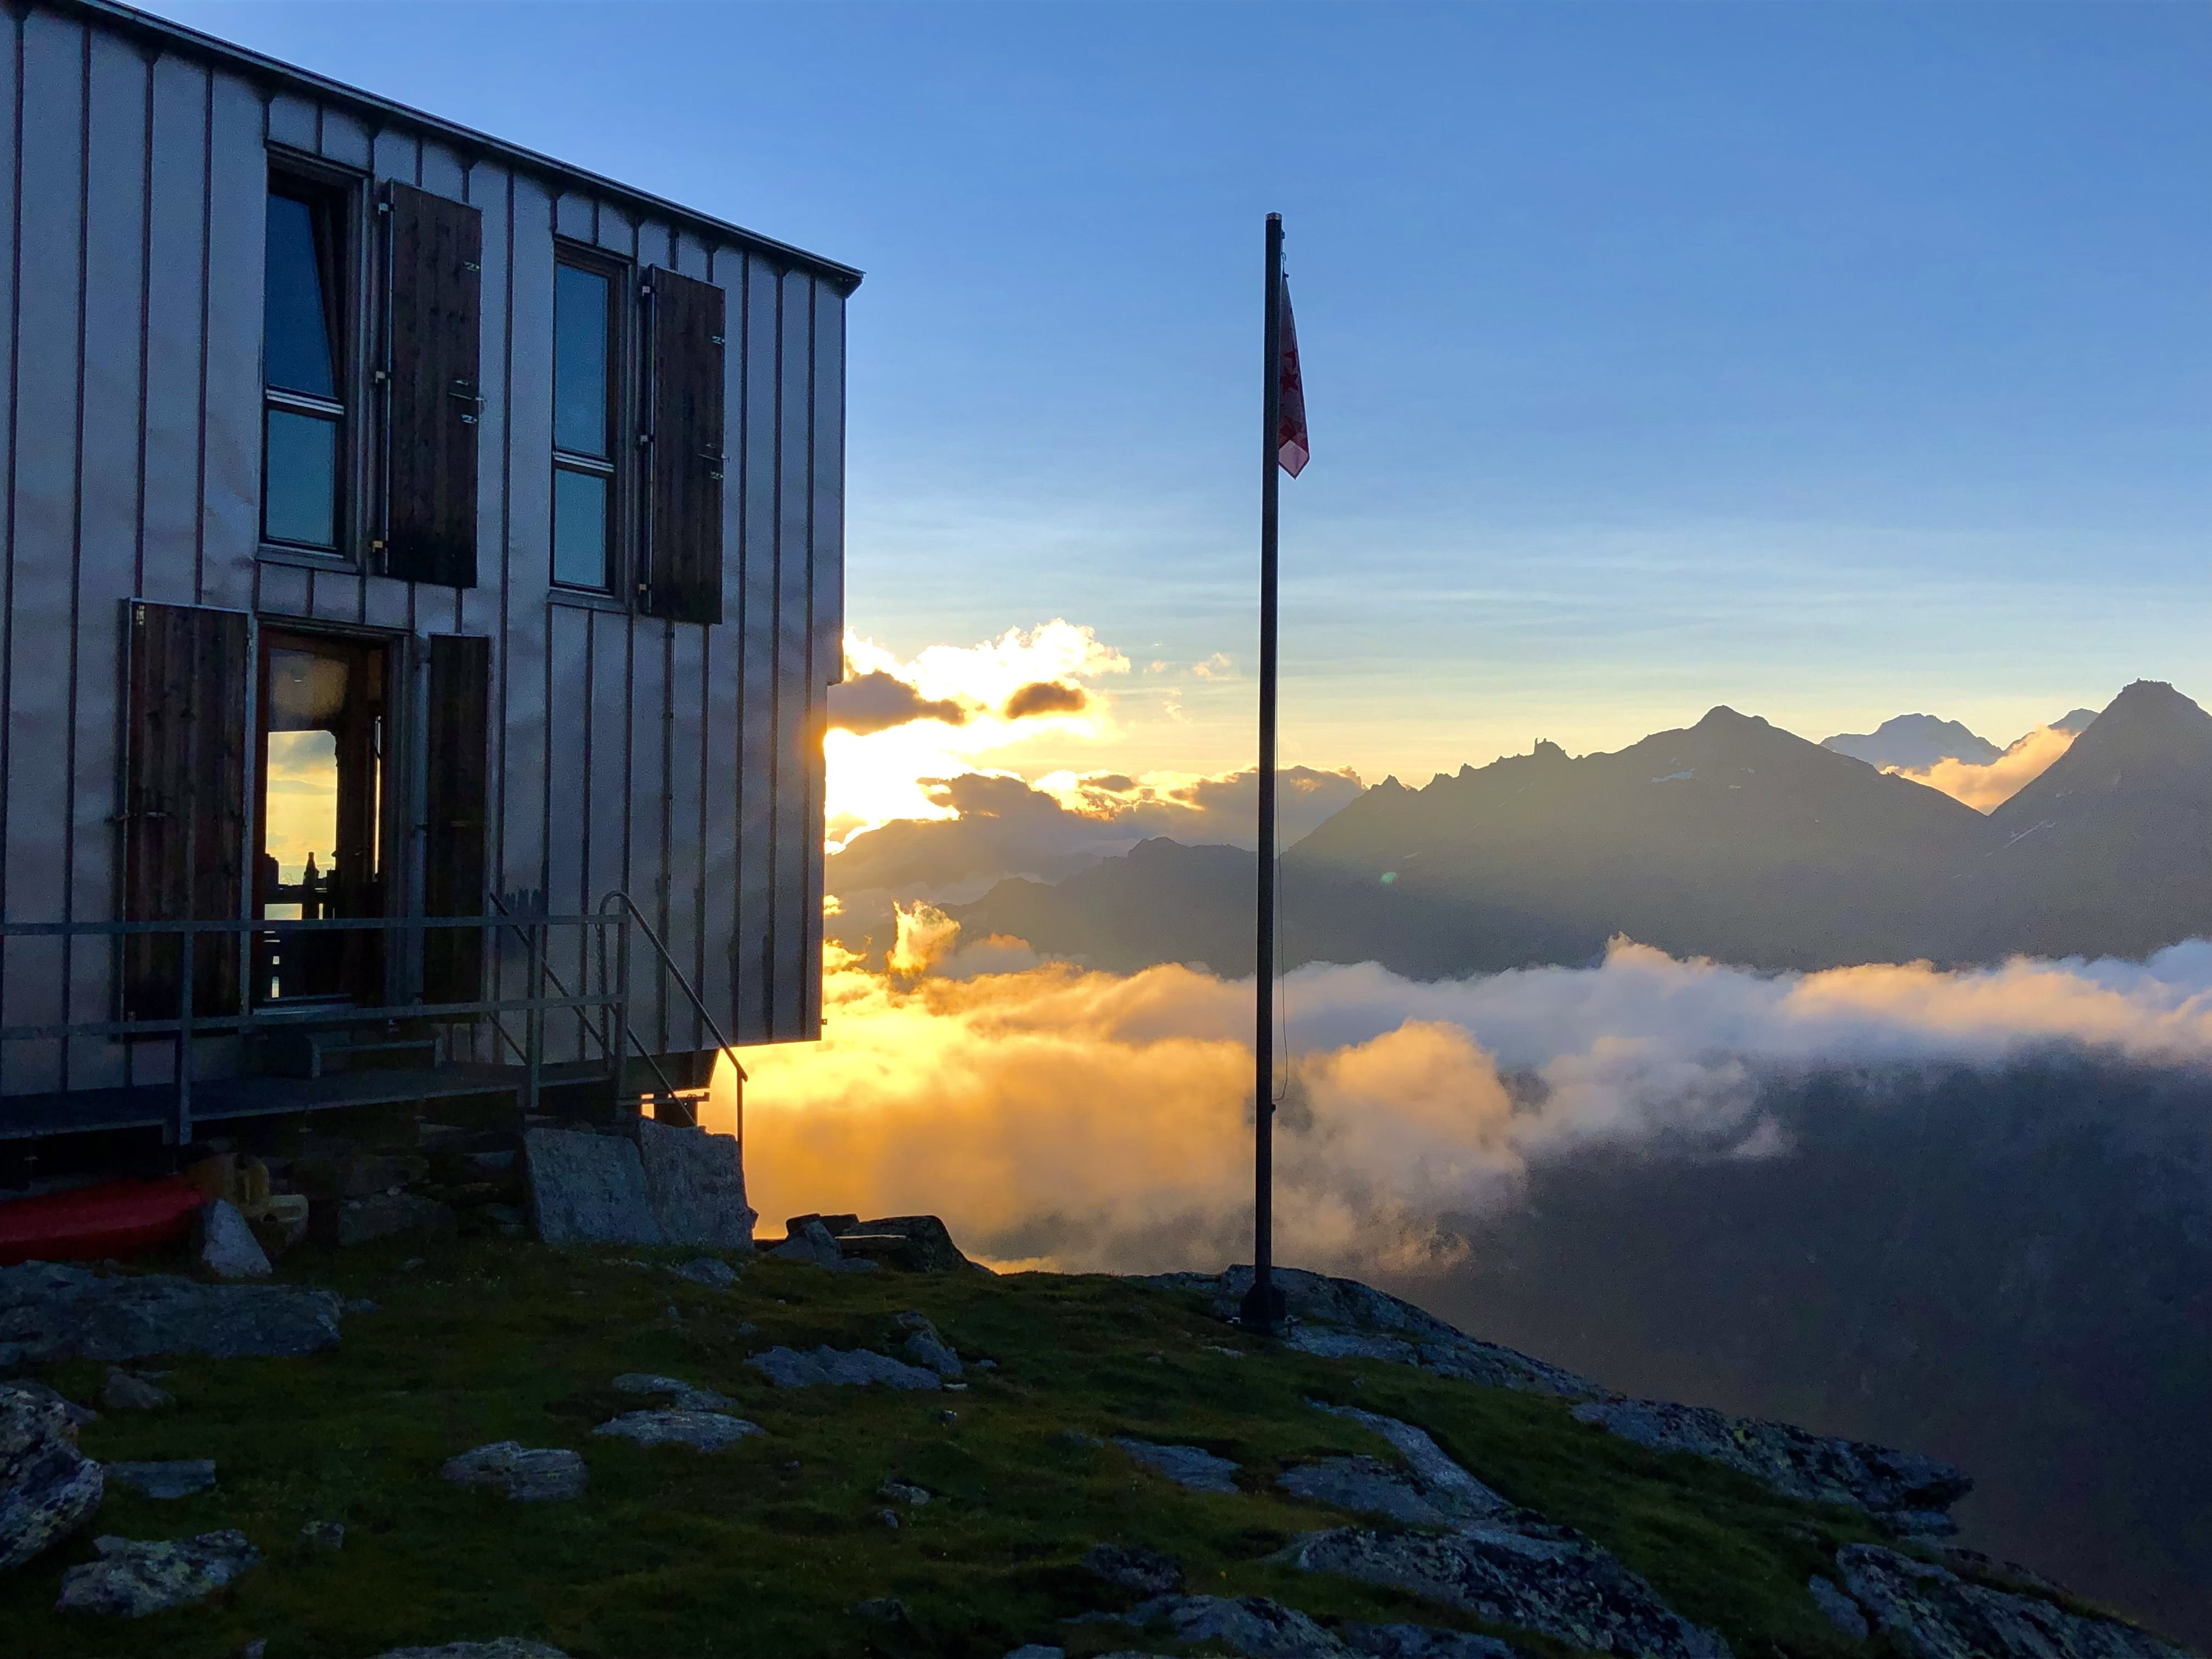 St-Niklas - Topalihütte (10-11.07.2021)